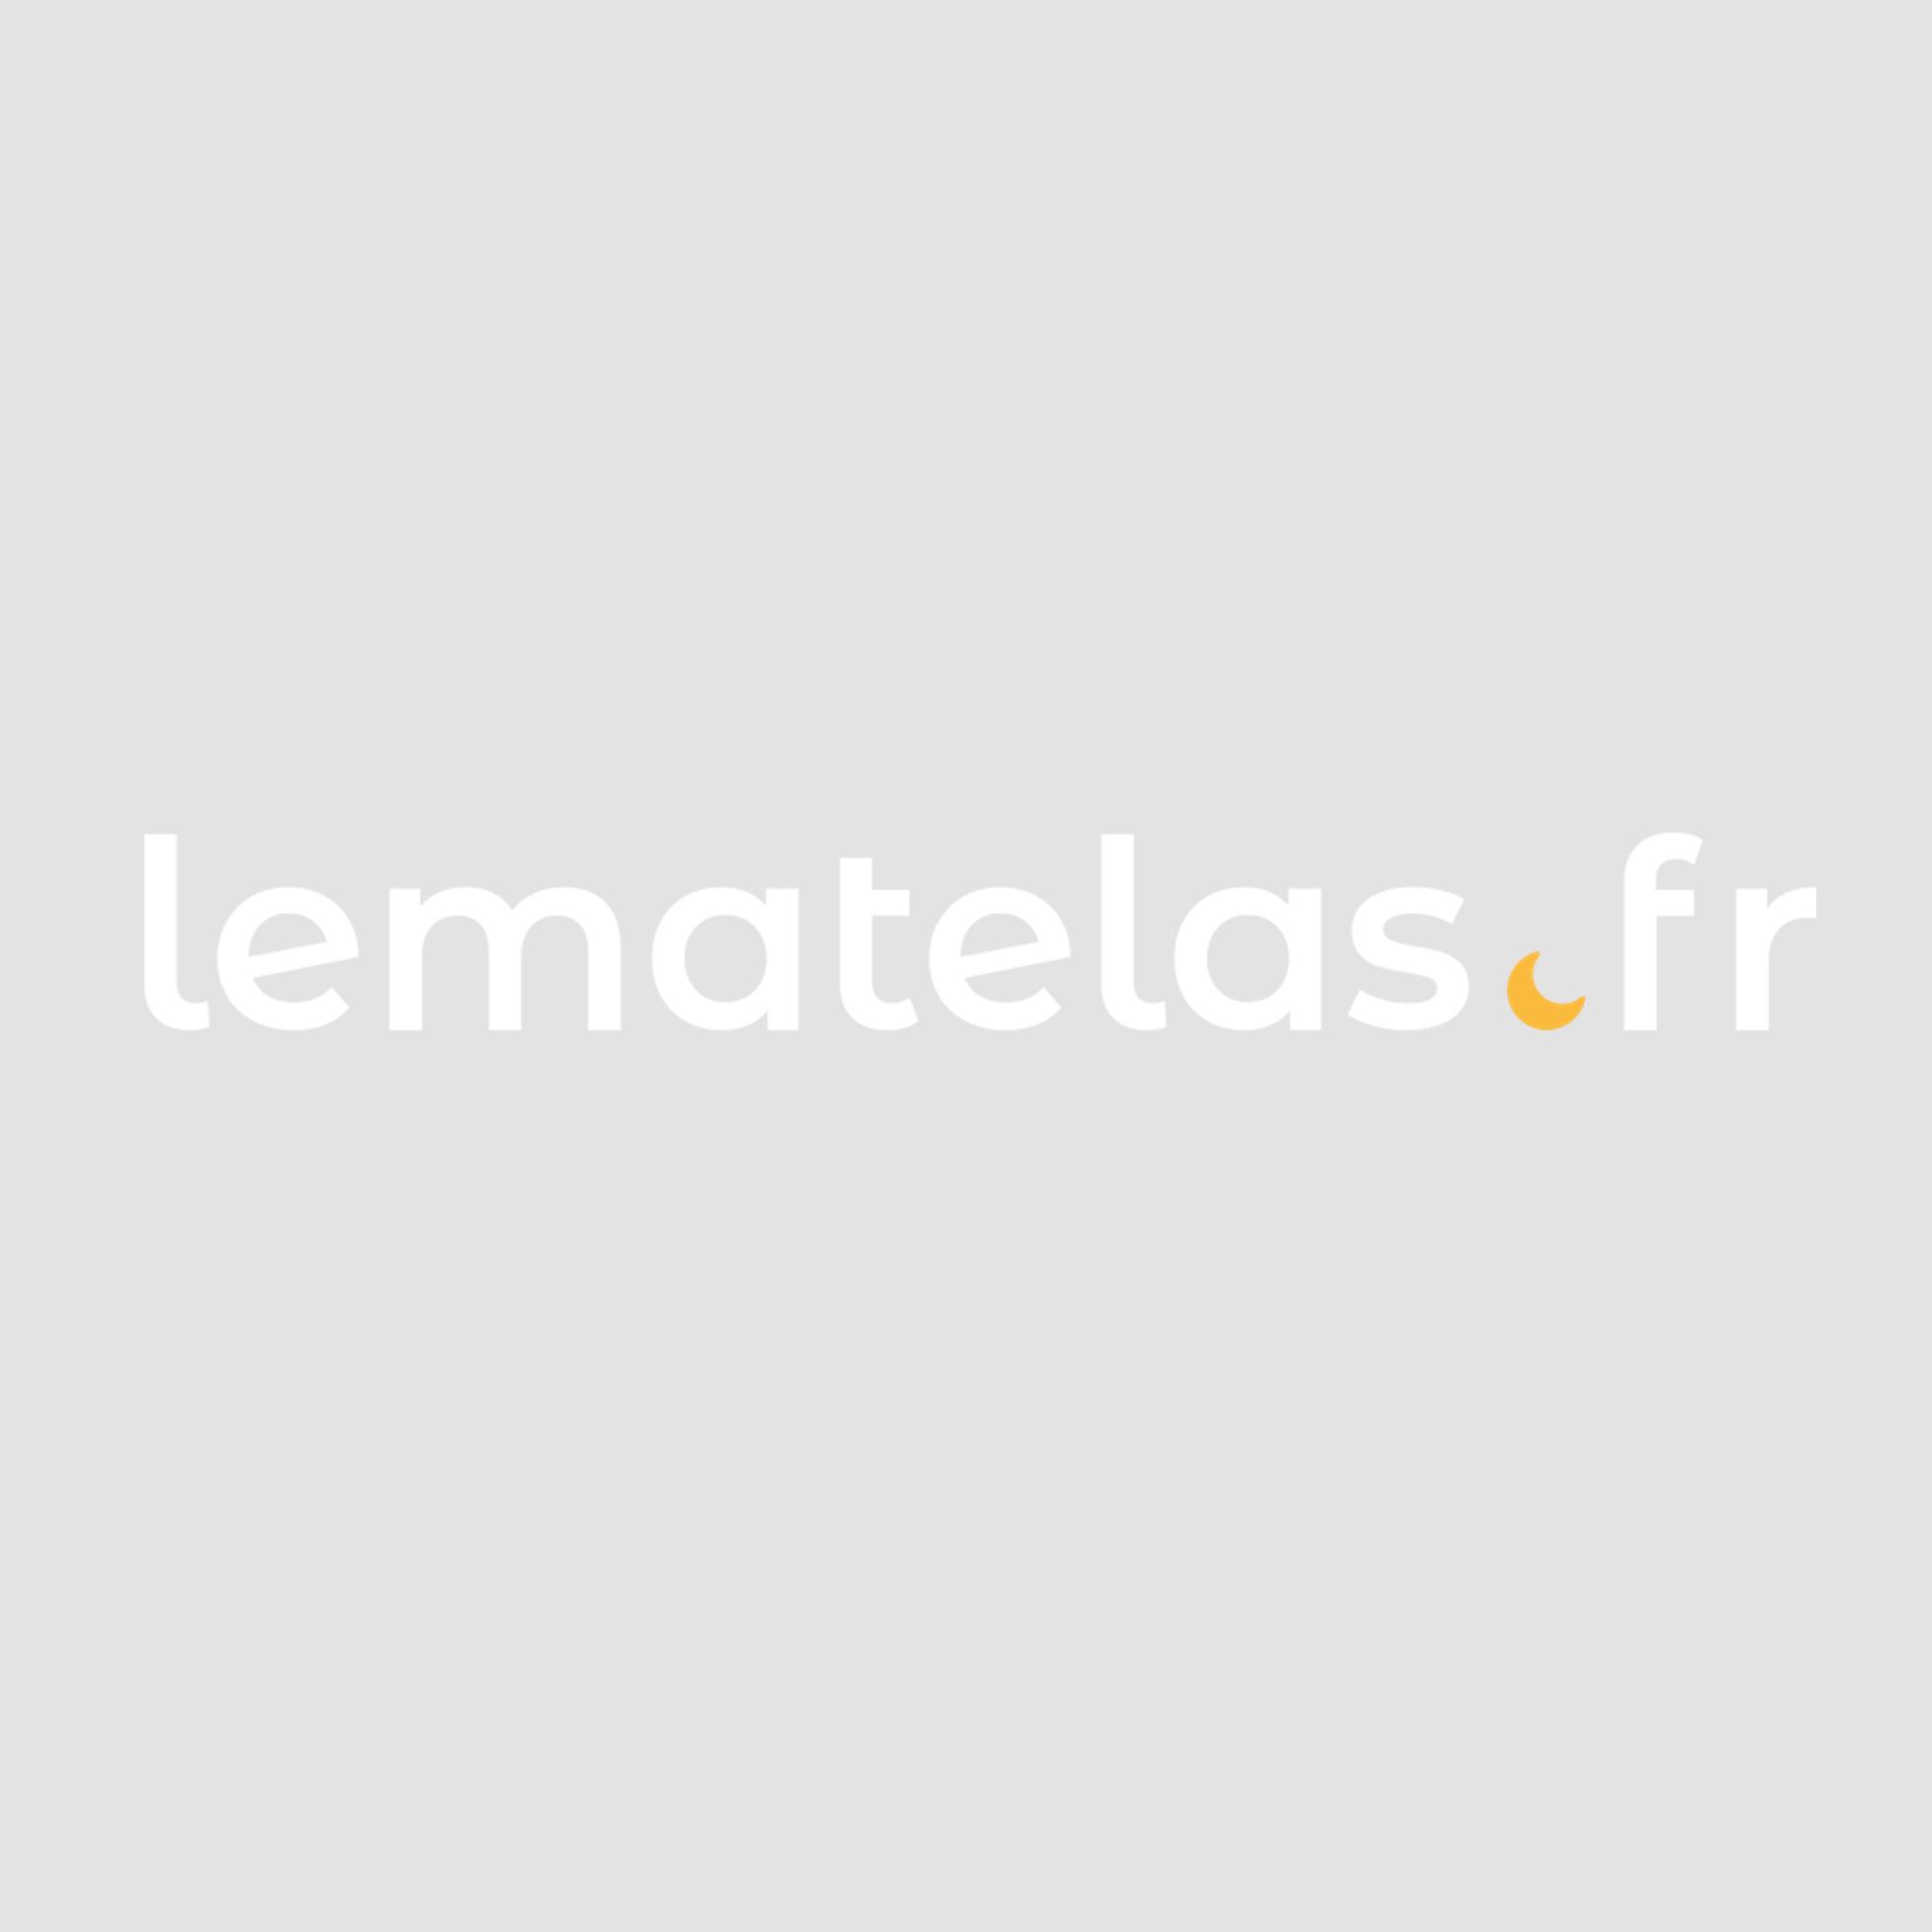 couette 400g imprim e etienne. Black Bedroom Furniture Sets. Home Design Ideas